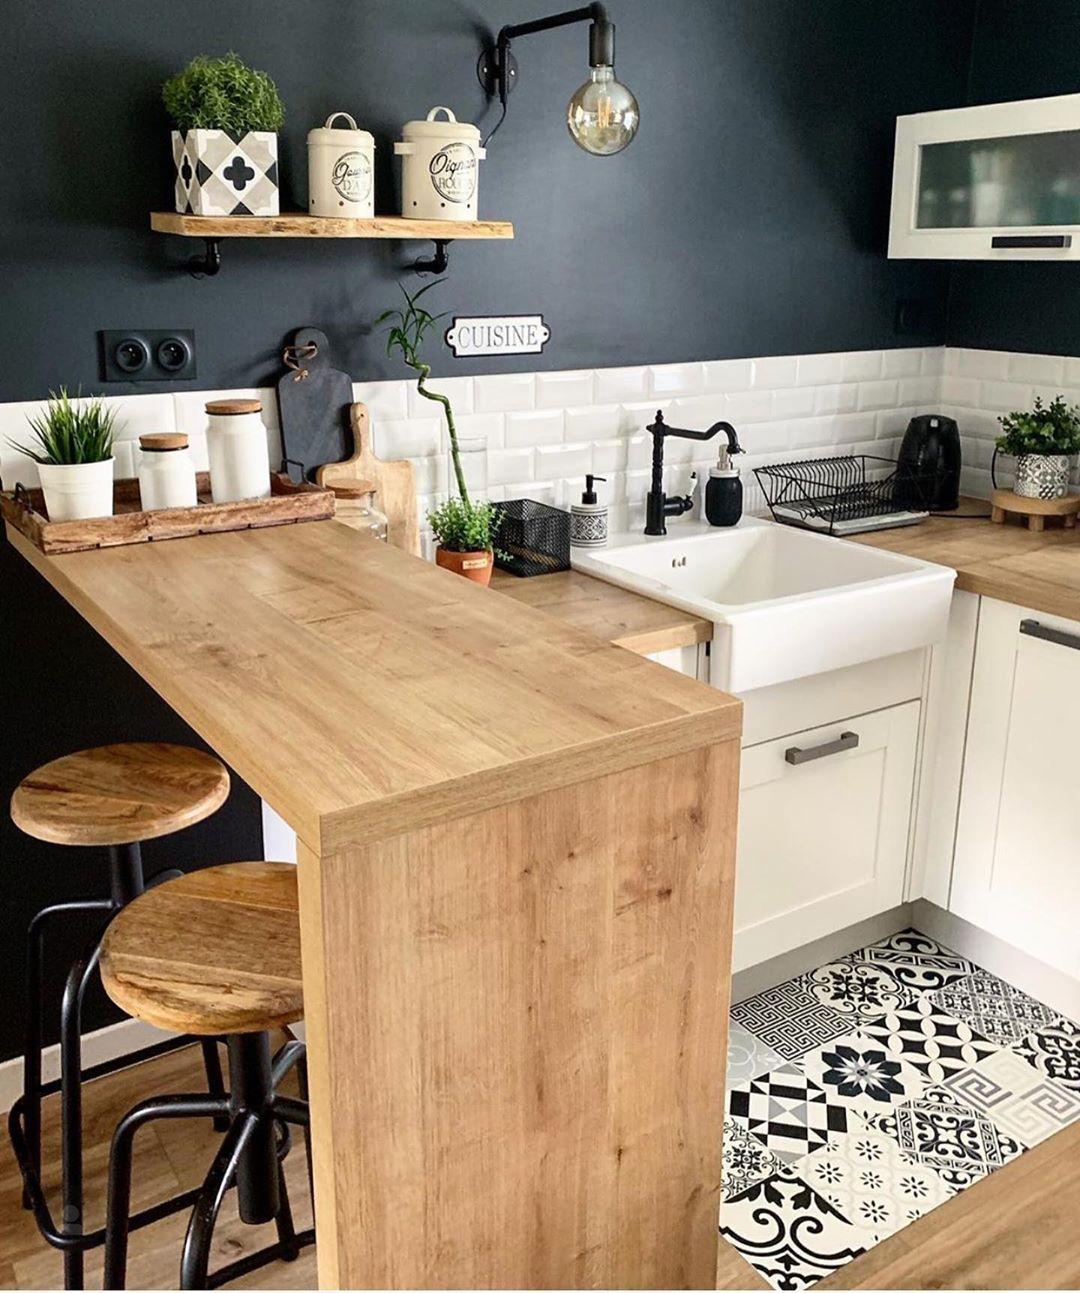 "Inspi_Deco on Instagram: ""▪️ Kitchen decor 💫 😍  Inspi @maryline._  #picoftheday #instalike #kitchen #kitchendesign #kitchendecor #kitchenview #homedecor…""  #amenagementcuisine #Decor #homedecor #inspi"